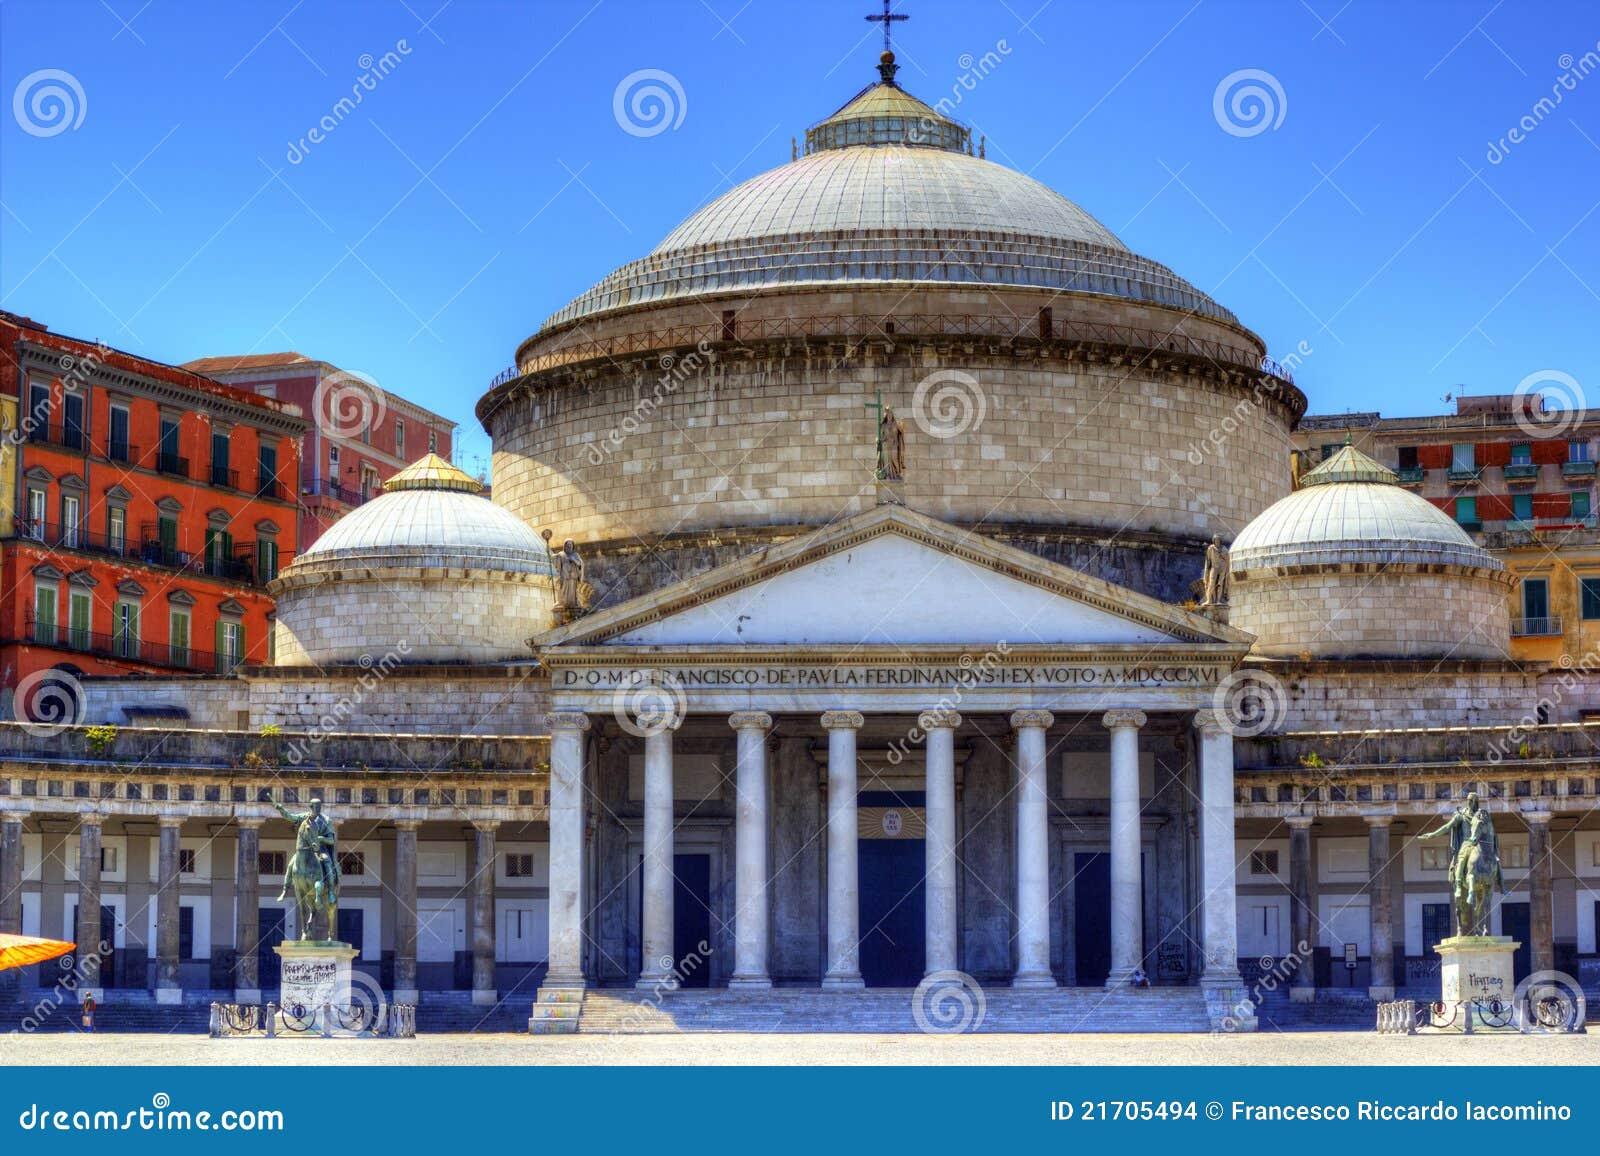 Plaza Plebiscito, Nápoles